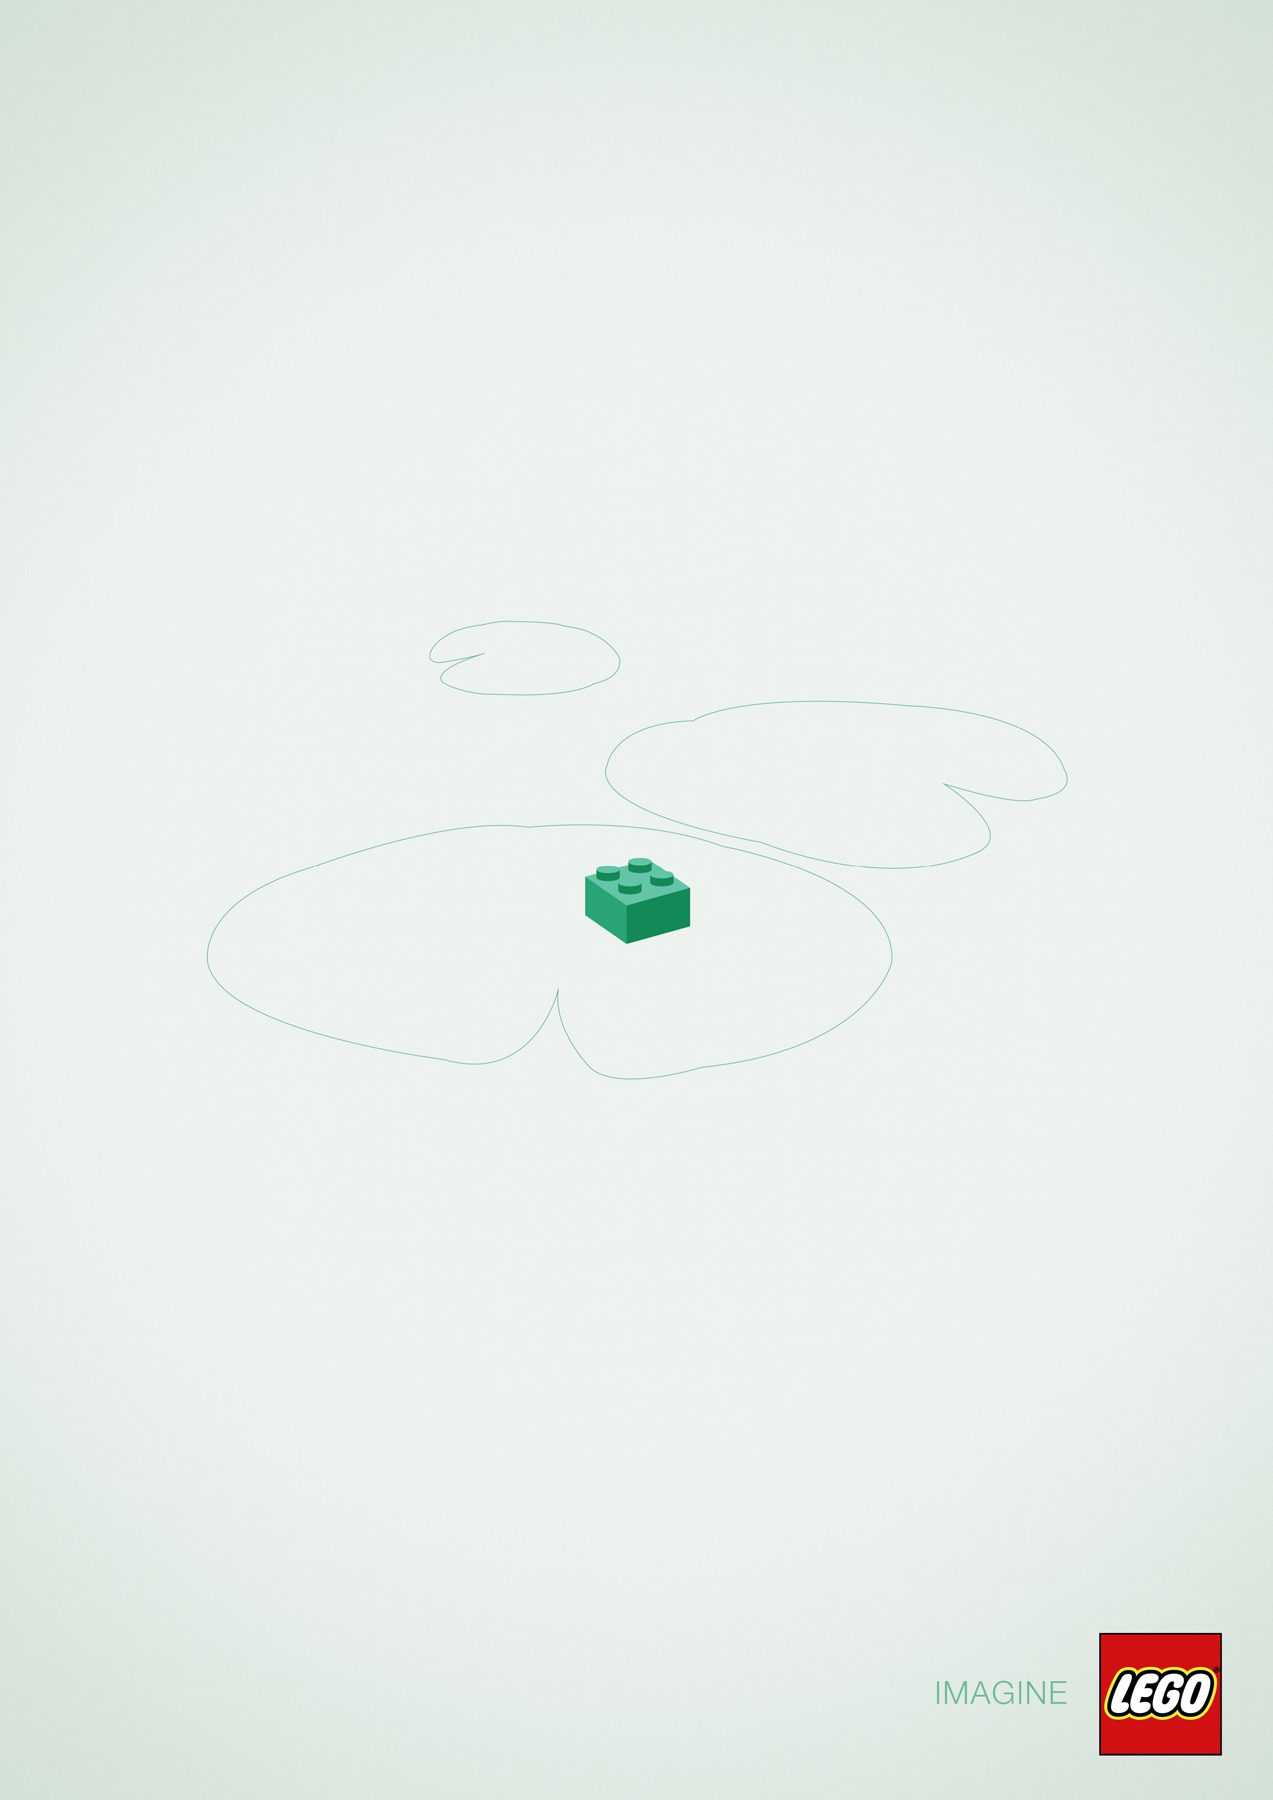 A frog - Lego Imagine